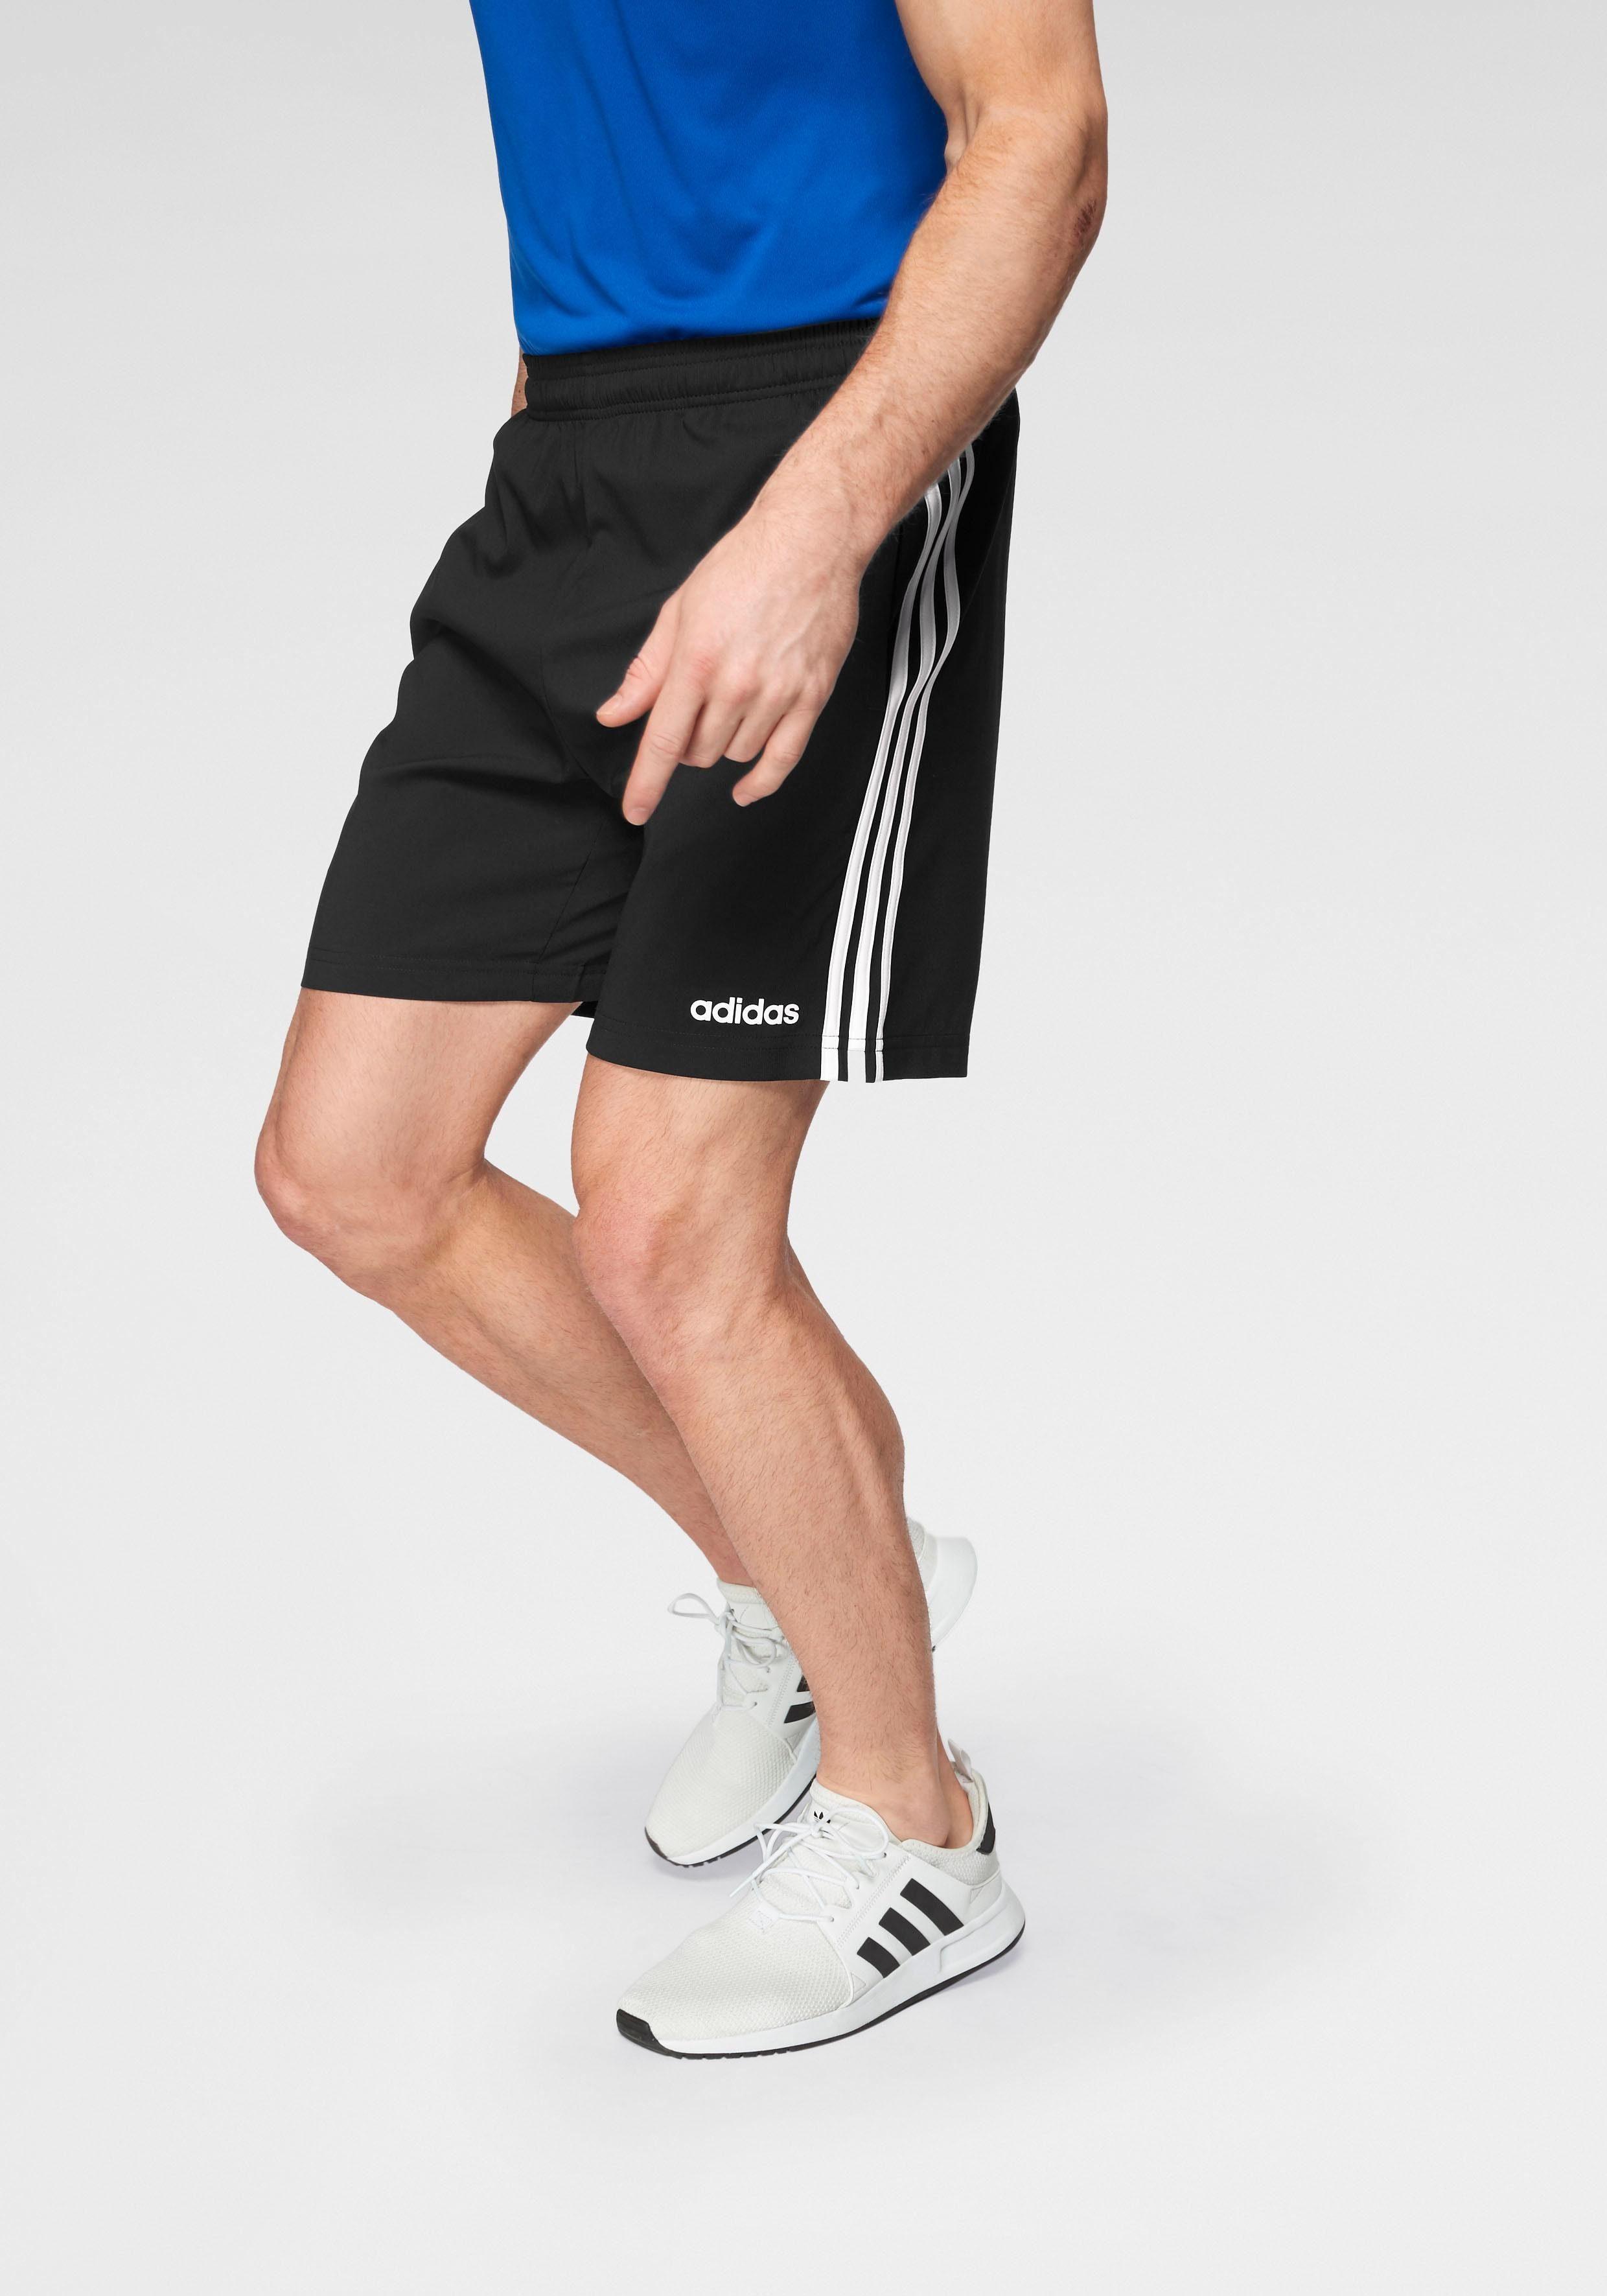 adidas Essentials 3 Stripes Chelsea adidas Sporthosen